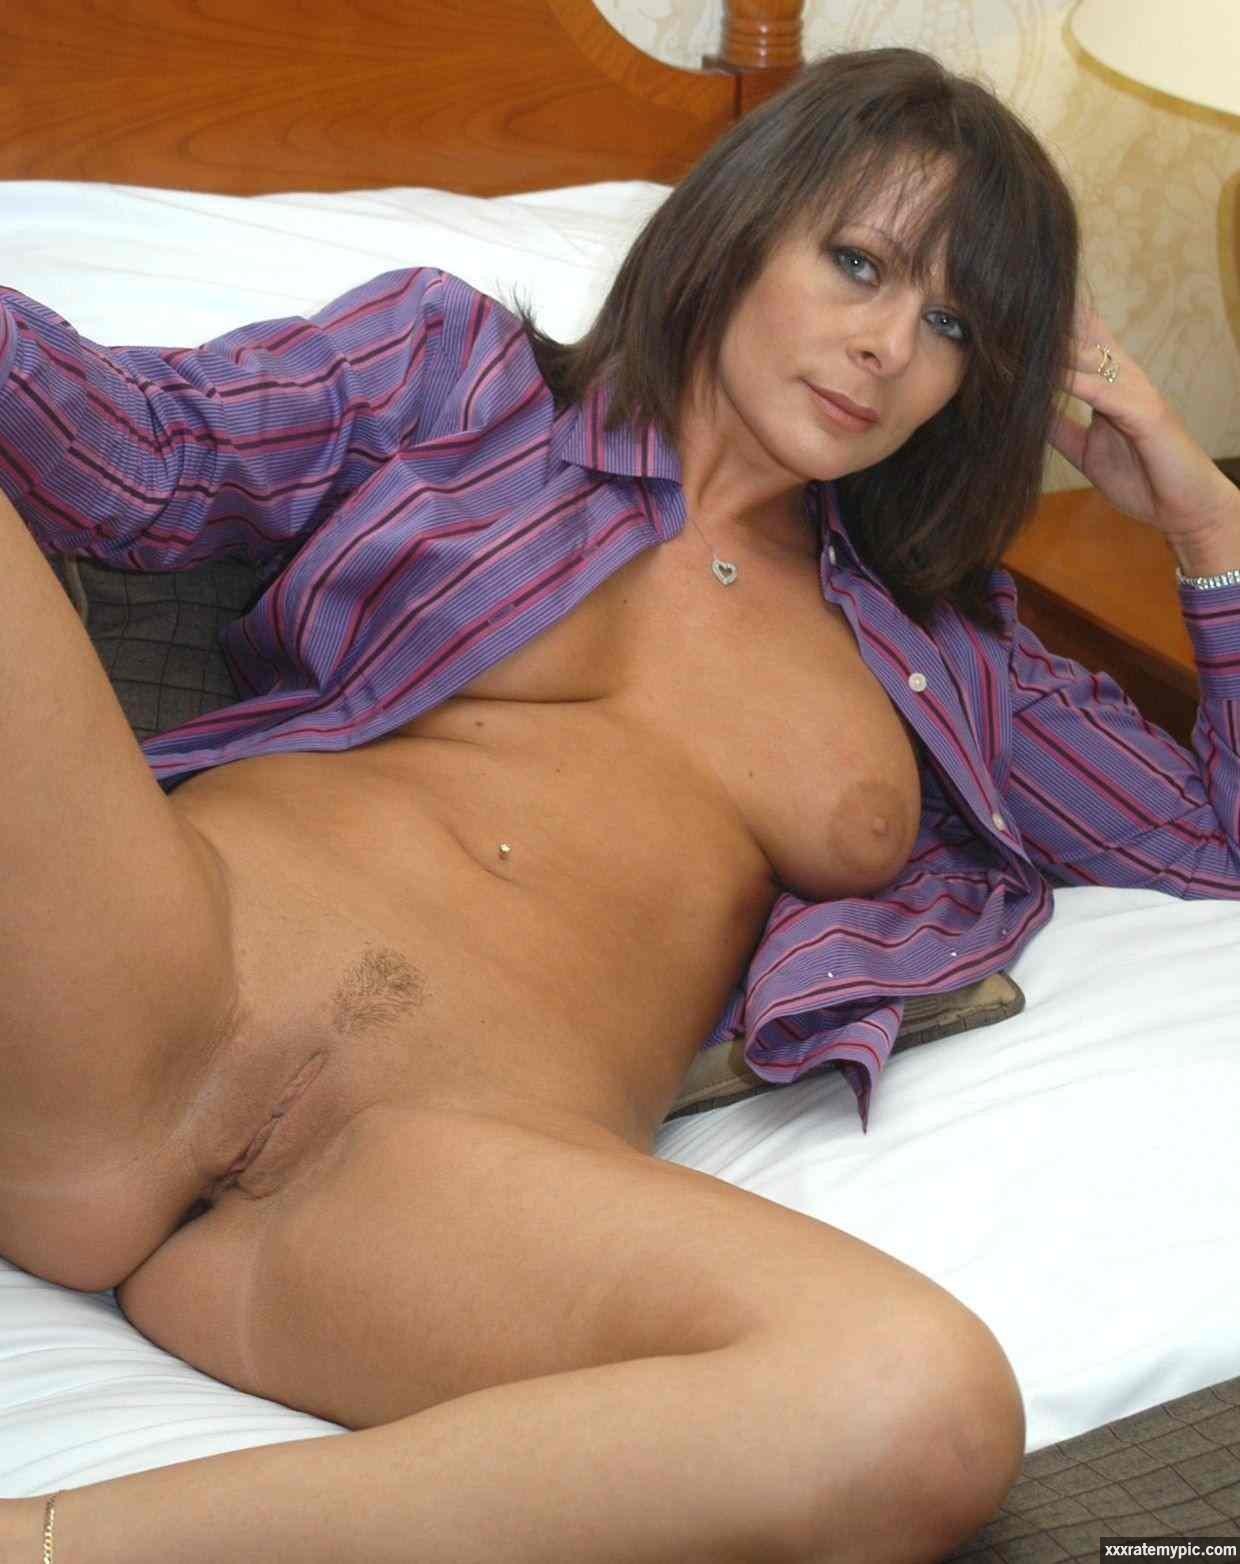 Milf Photos Photos Milf Erotic Photo Tits Boobs Sexy Breasts Cougar ...